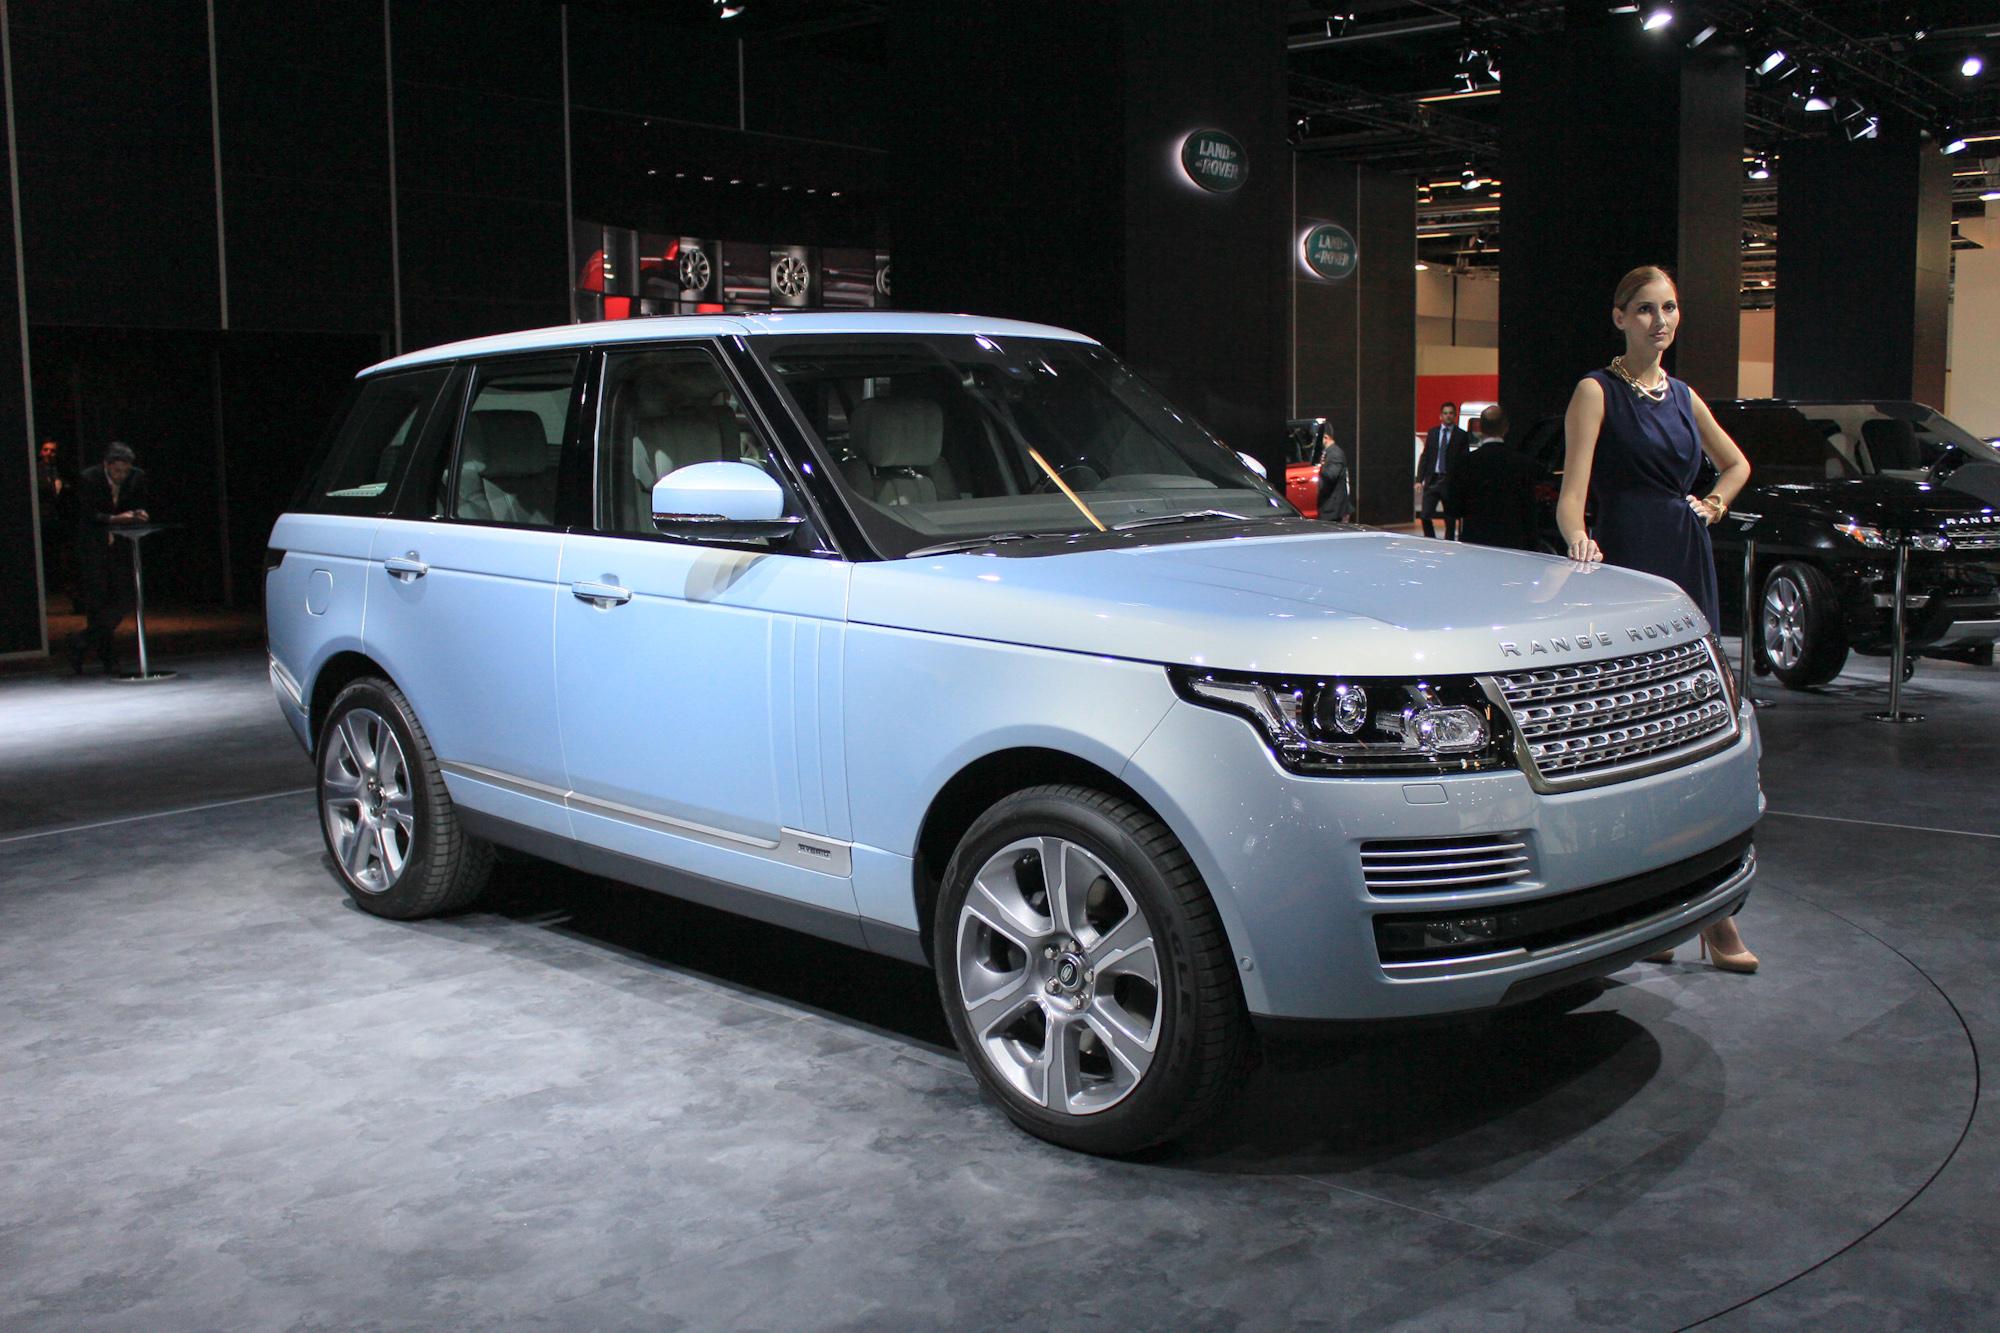 https://images.hgmsites.net/hug/2015-land-rover-range-rover-hybrid-2013-frankfurt-auto-show_100439726_h.jpg